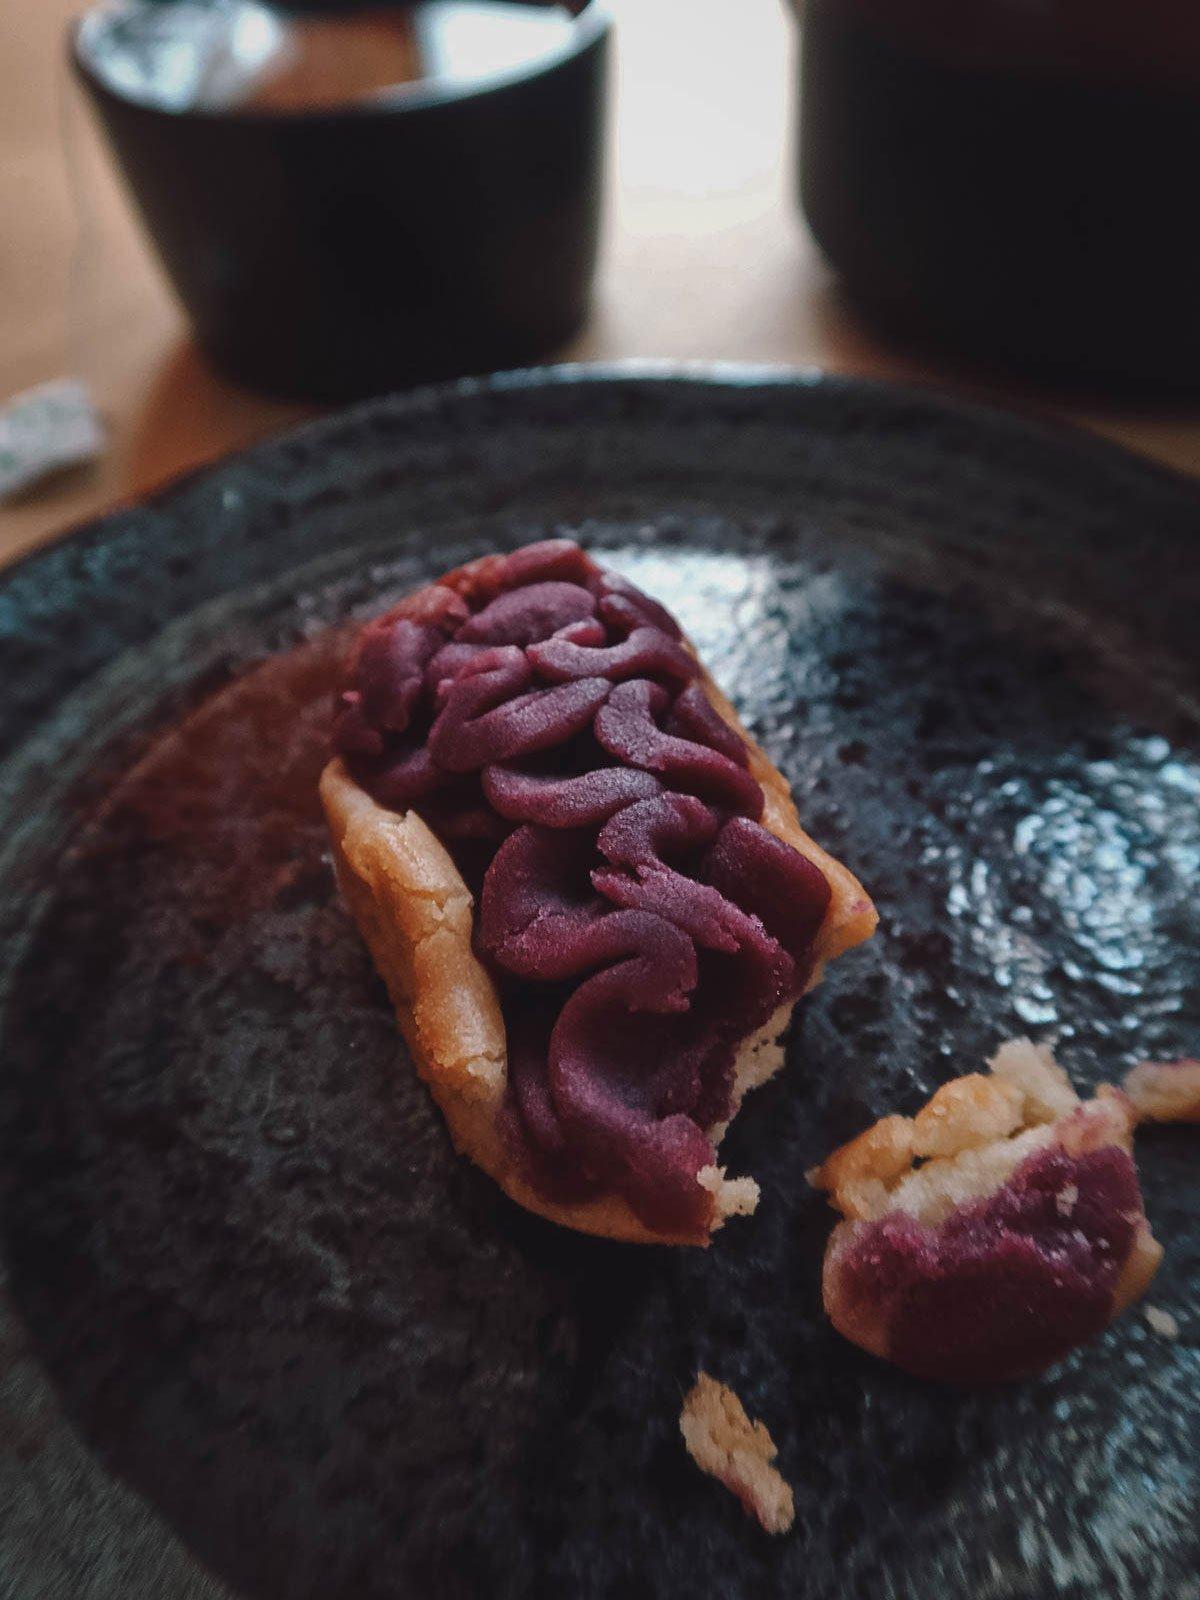 Beni imo tart with Japanese teapot and plates